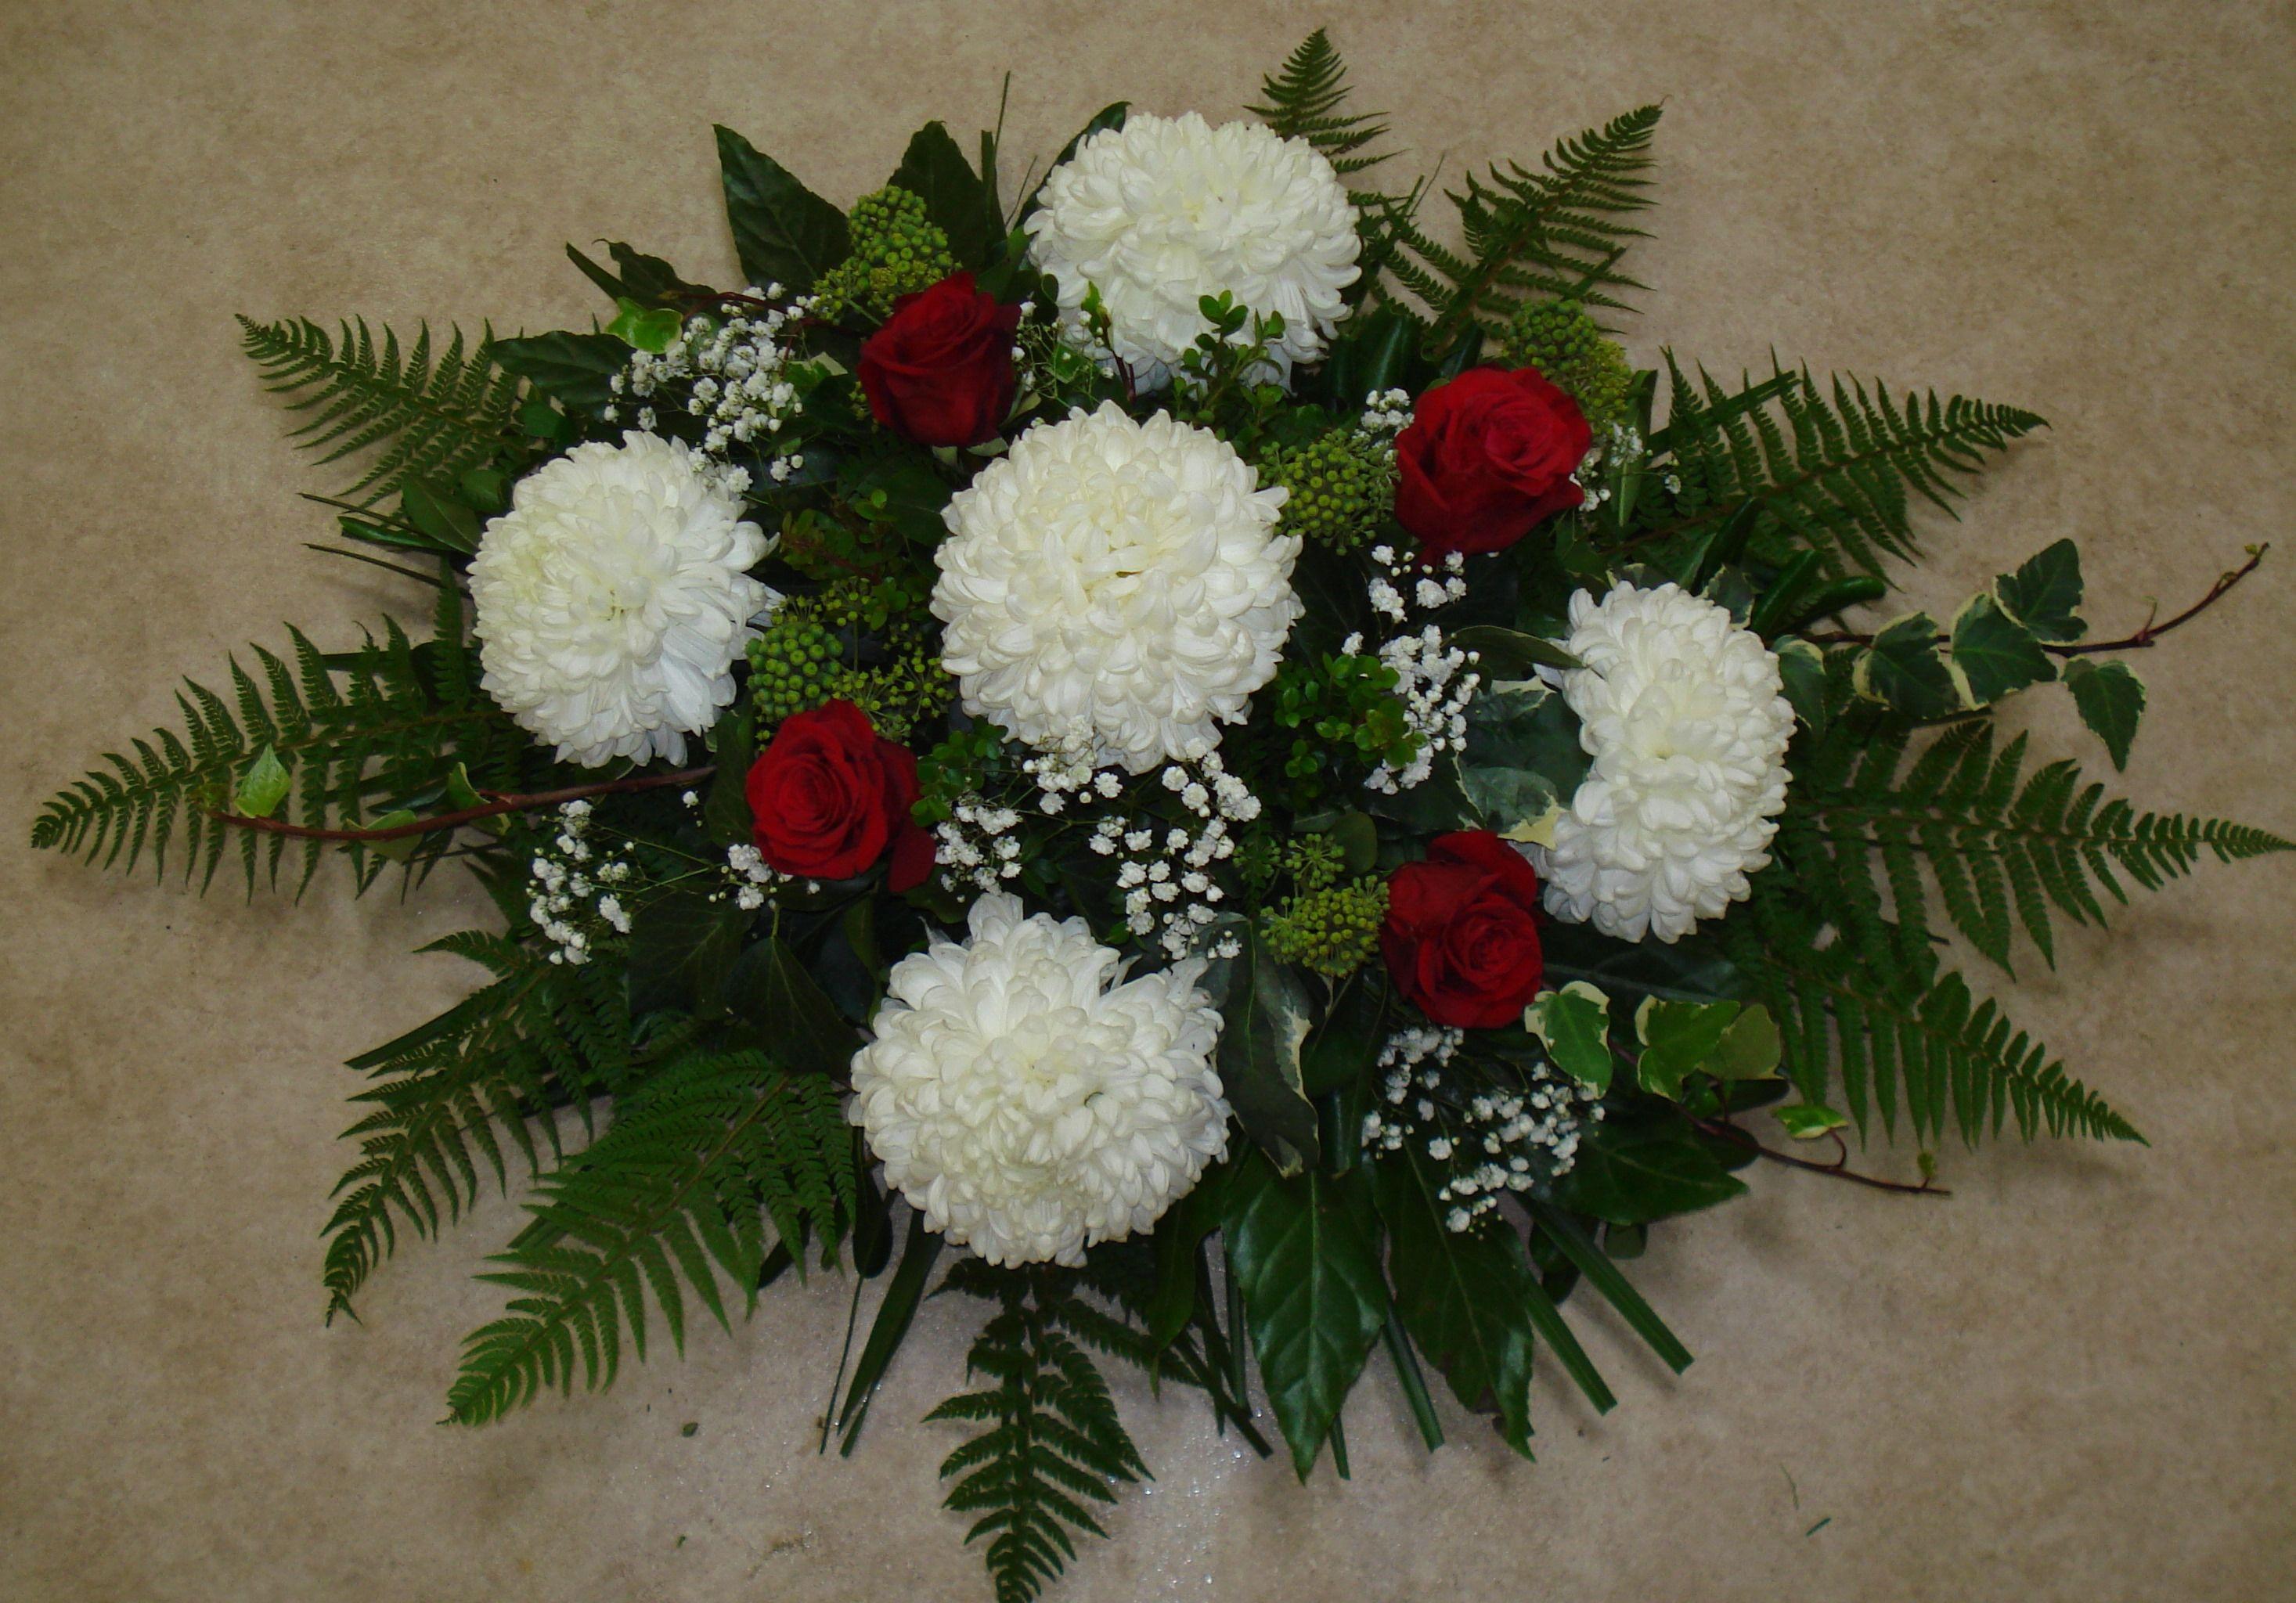 floor vase floral arrangements of slikovni rezultat za aranac2bemani od krizantema i apina funeral in slikovni rezultat za aranac2bemani od krizantema i apina funeral arrangements flower arr